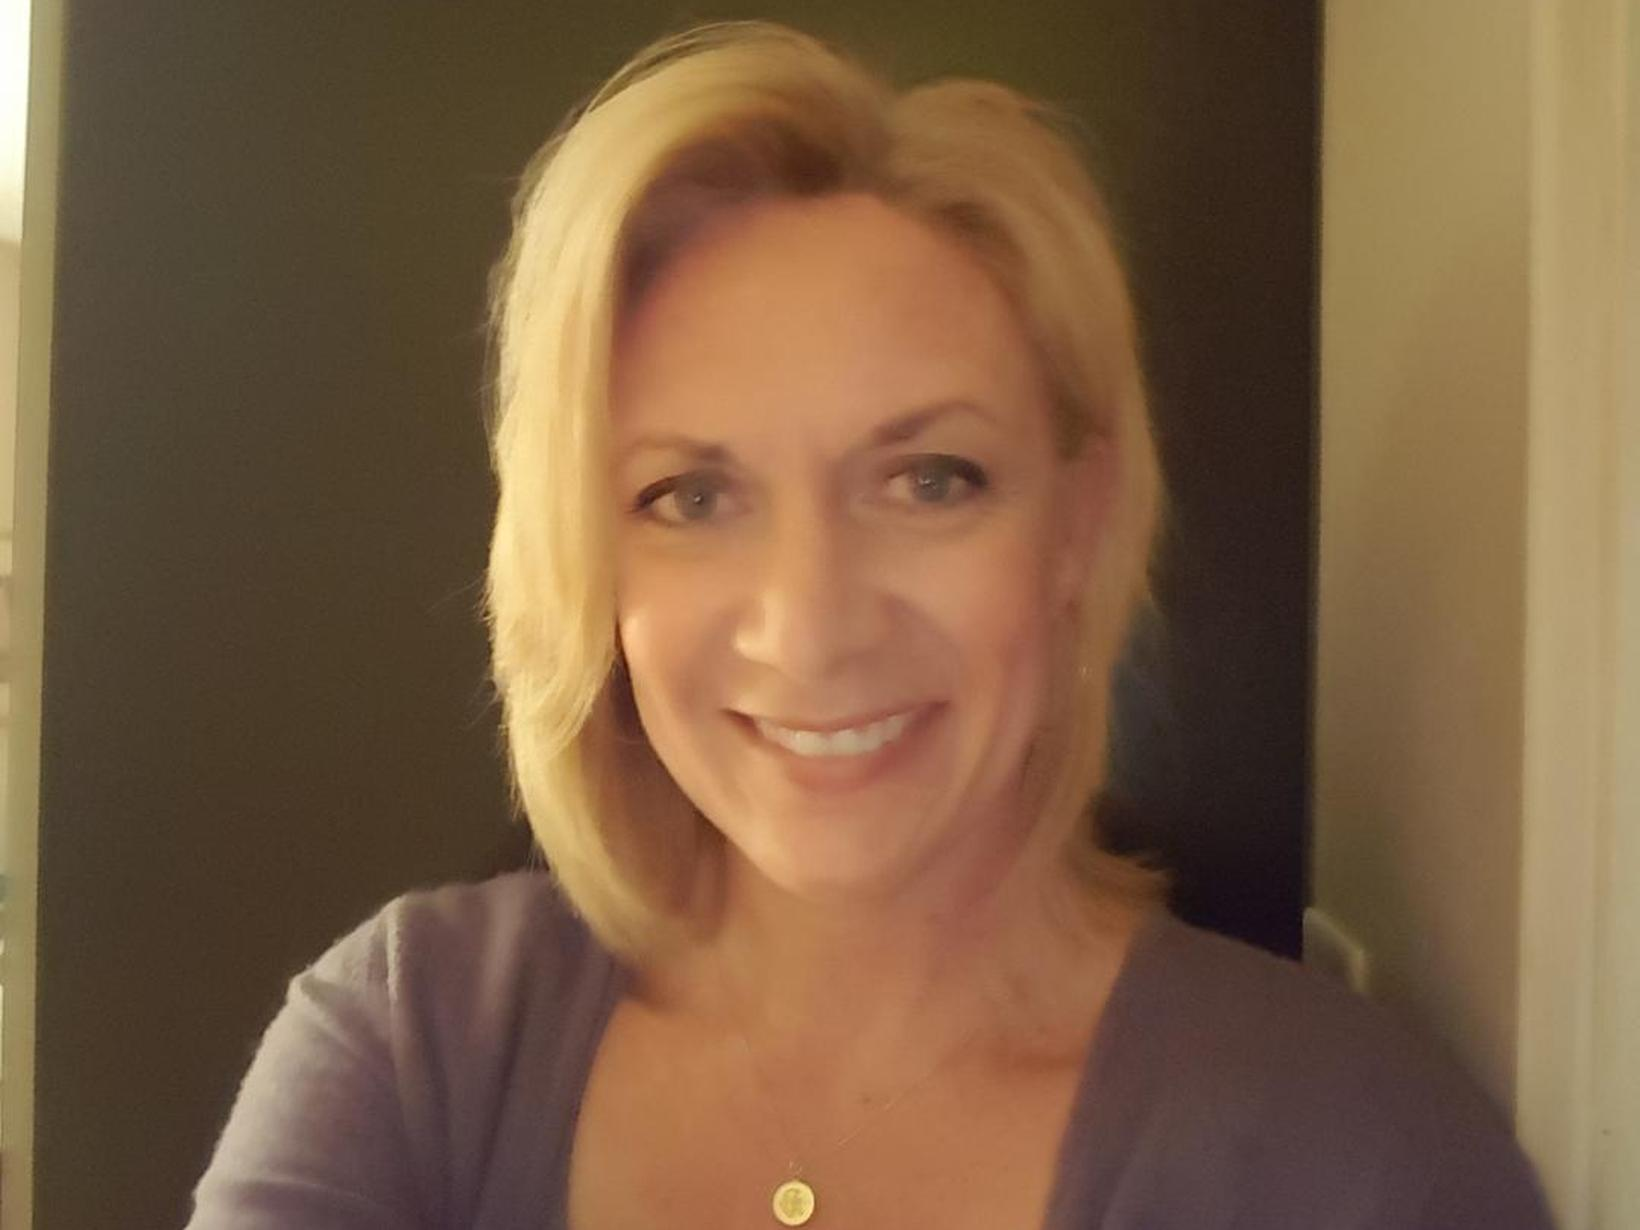 Catherine from Chicago, Illinois, United States